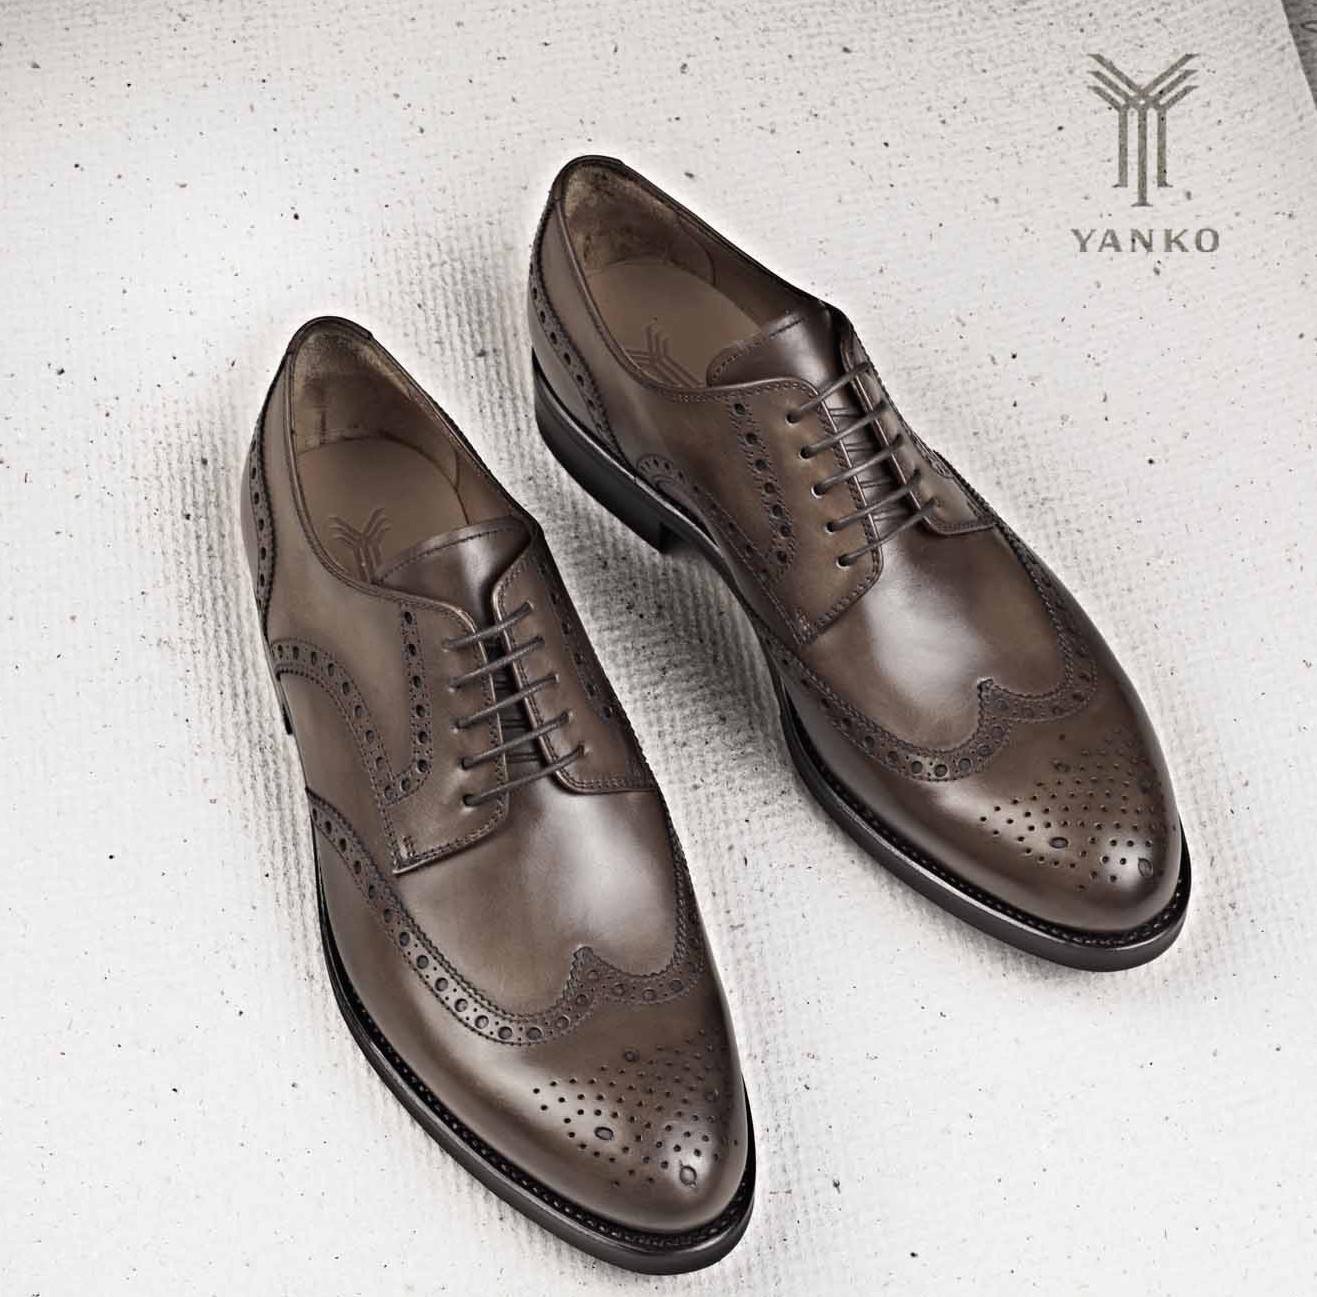 Yanko - PG Selection 1